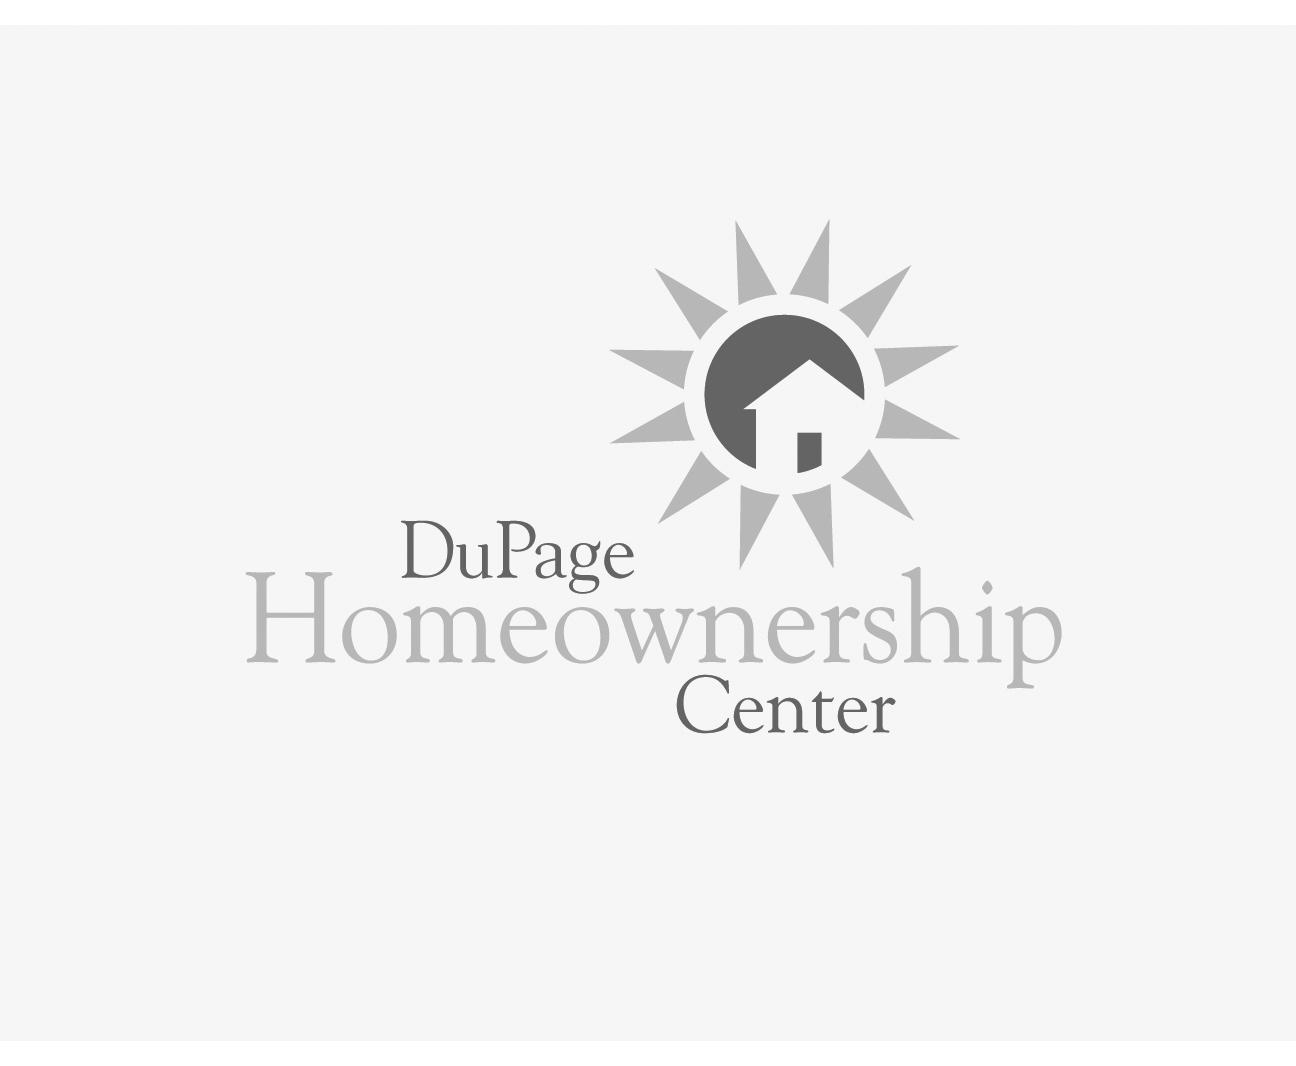 logo_dupage_homeowners_gs.jpg